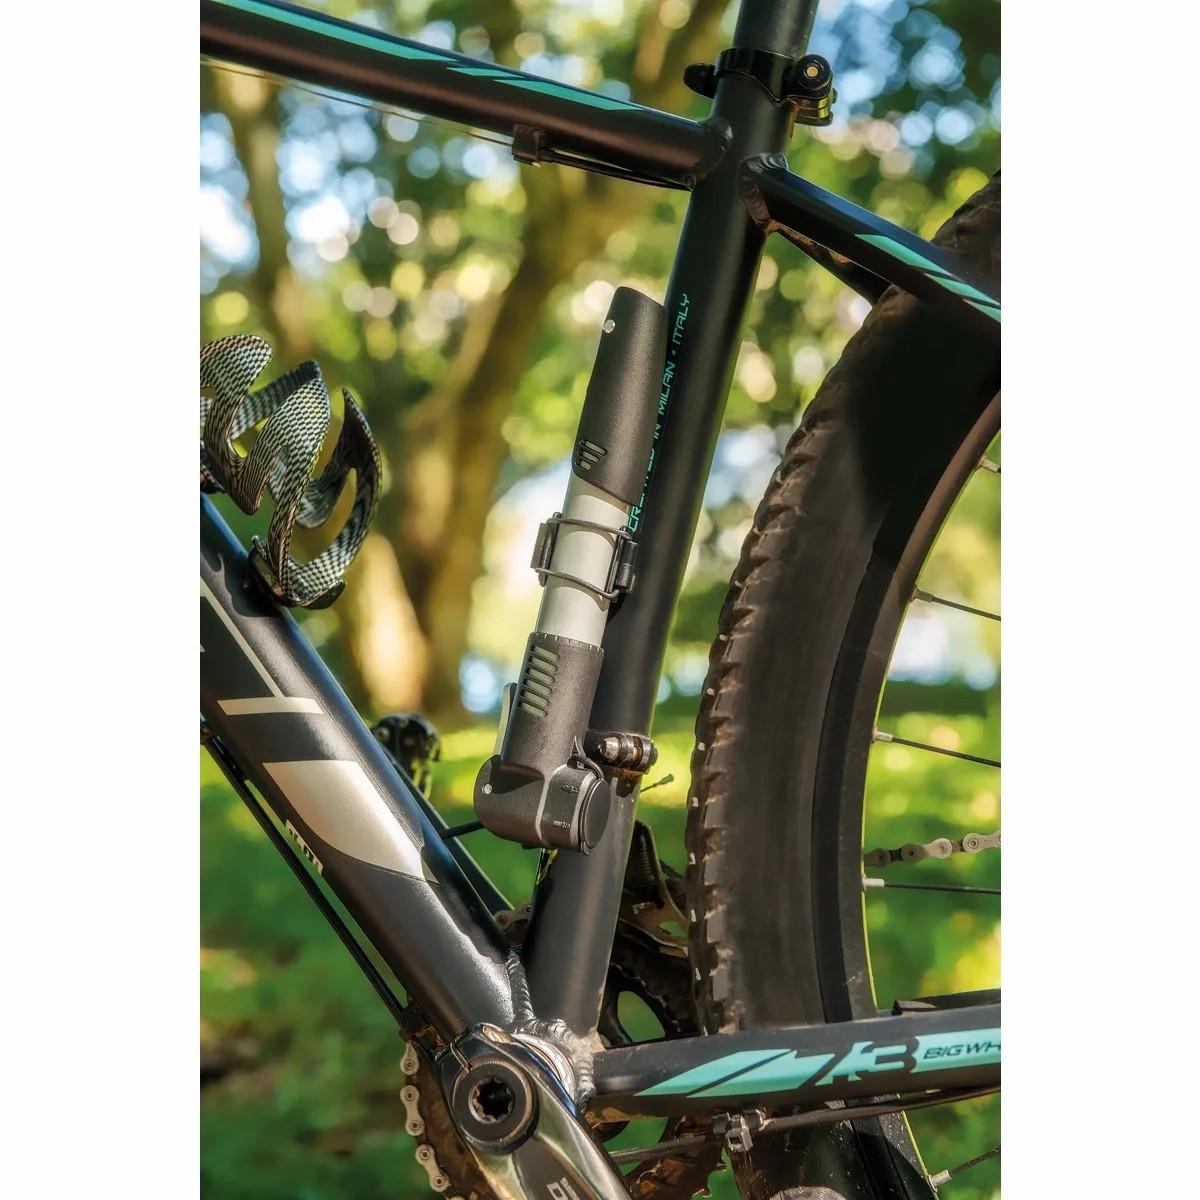 Bomba de Ar Portátil para Bicicleta - Tramontina